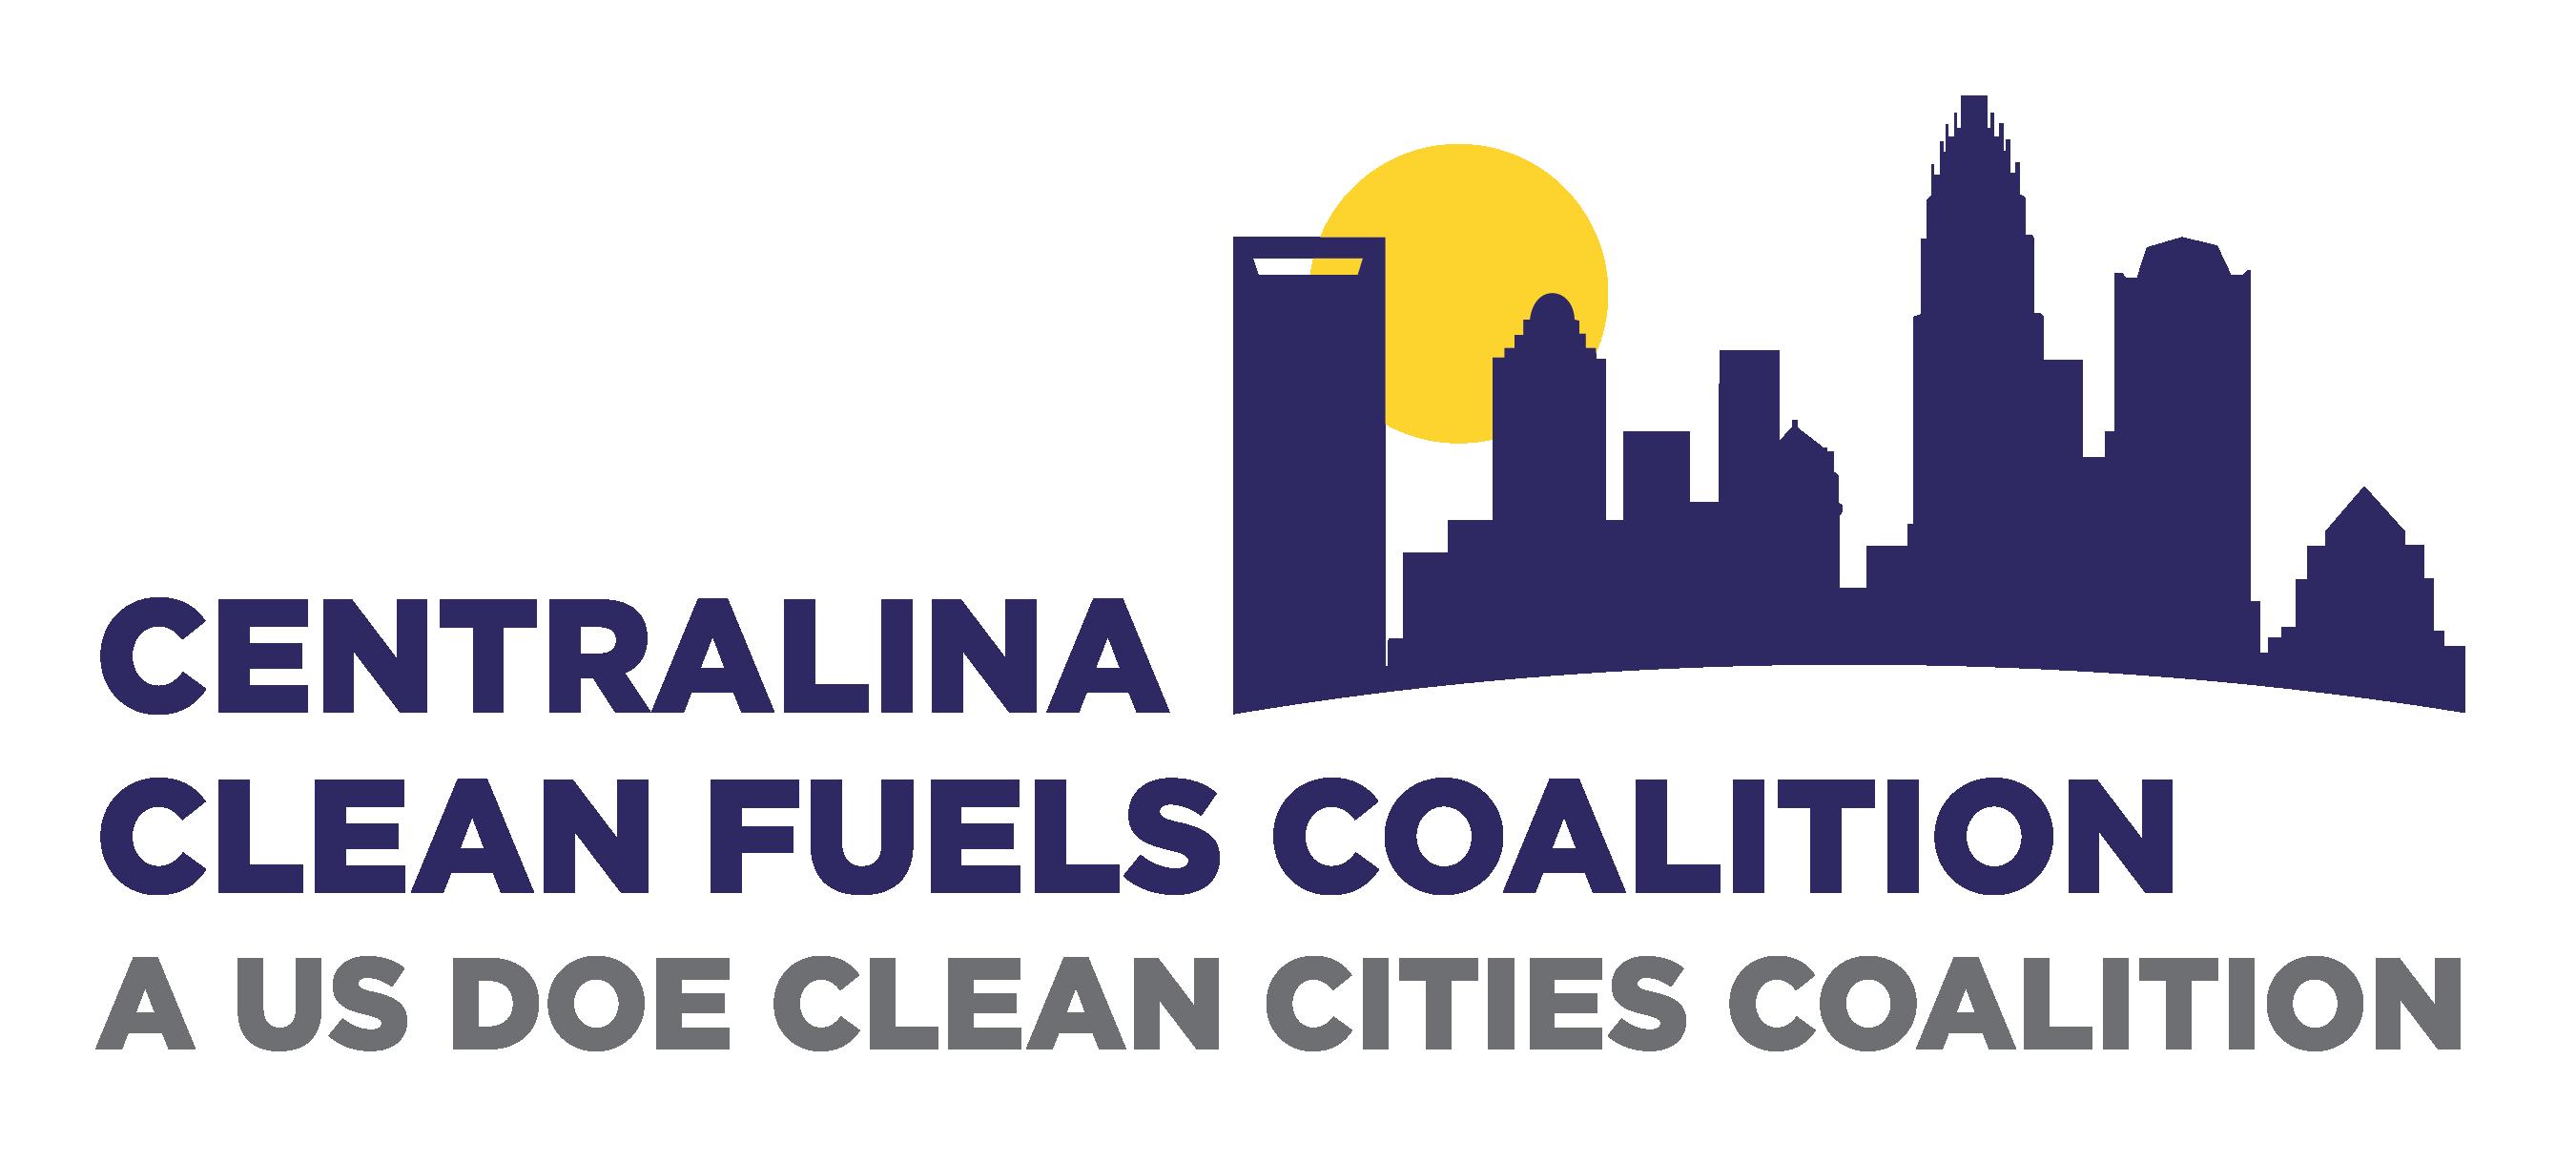 Centralina Clean Fuels Coalition Logo